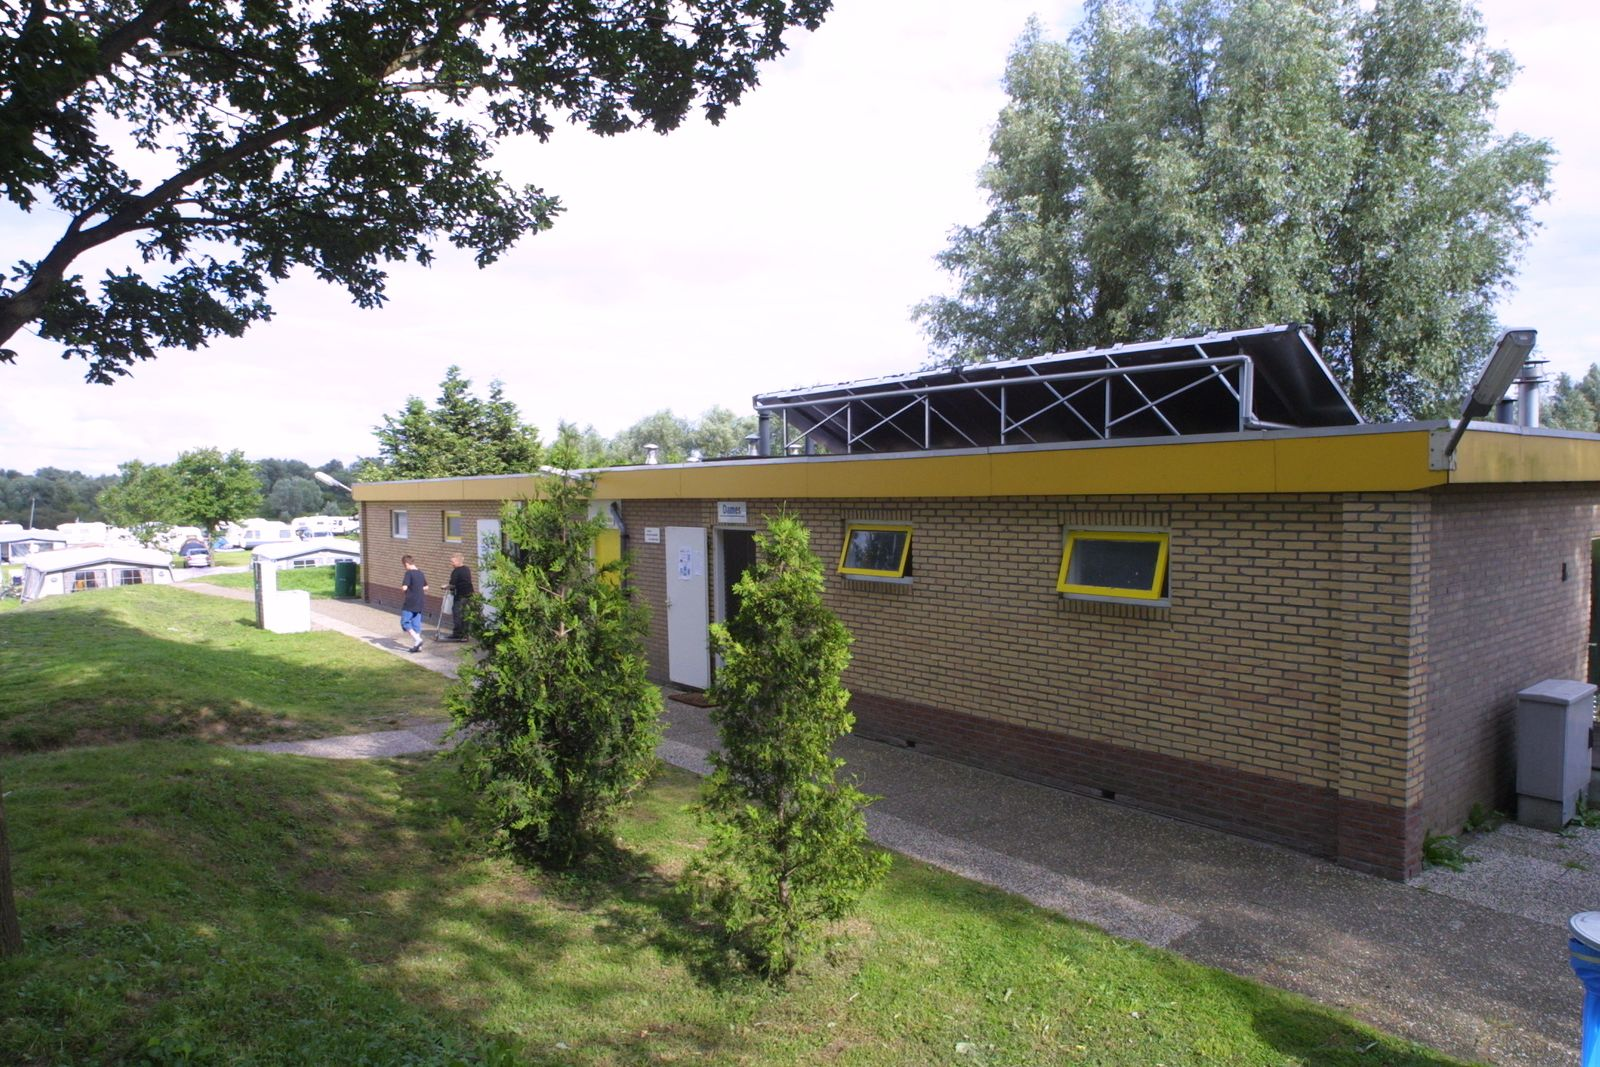 Afbeelding van Kampeerplaats IJsselweide